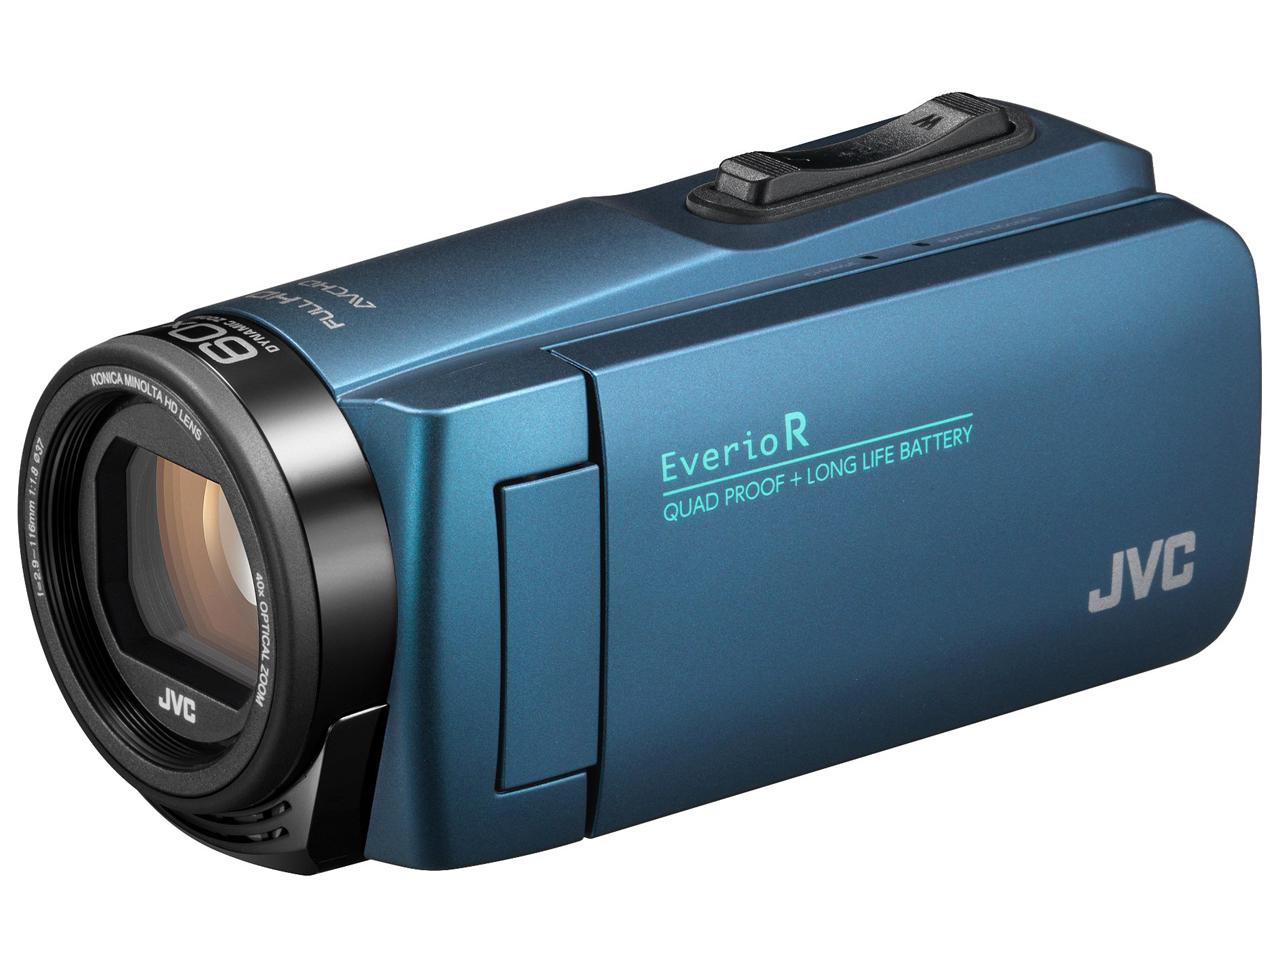 Everio R GZ-R480-A [ネイビーブルー] の製品画像